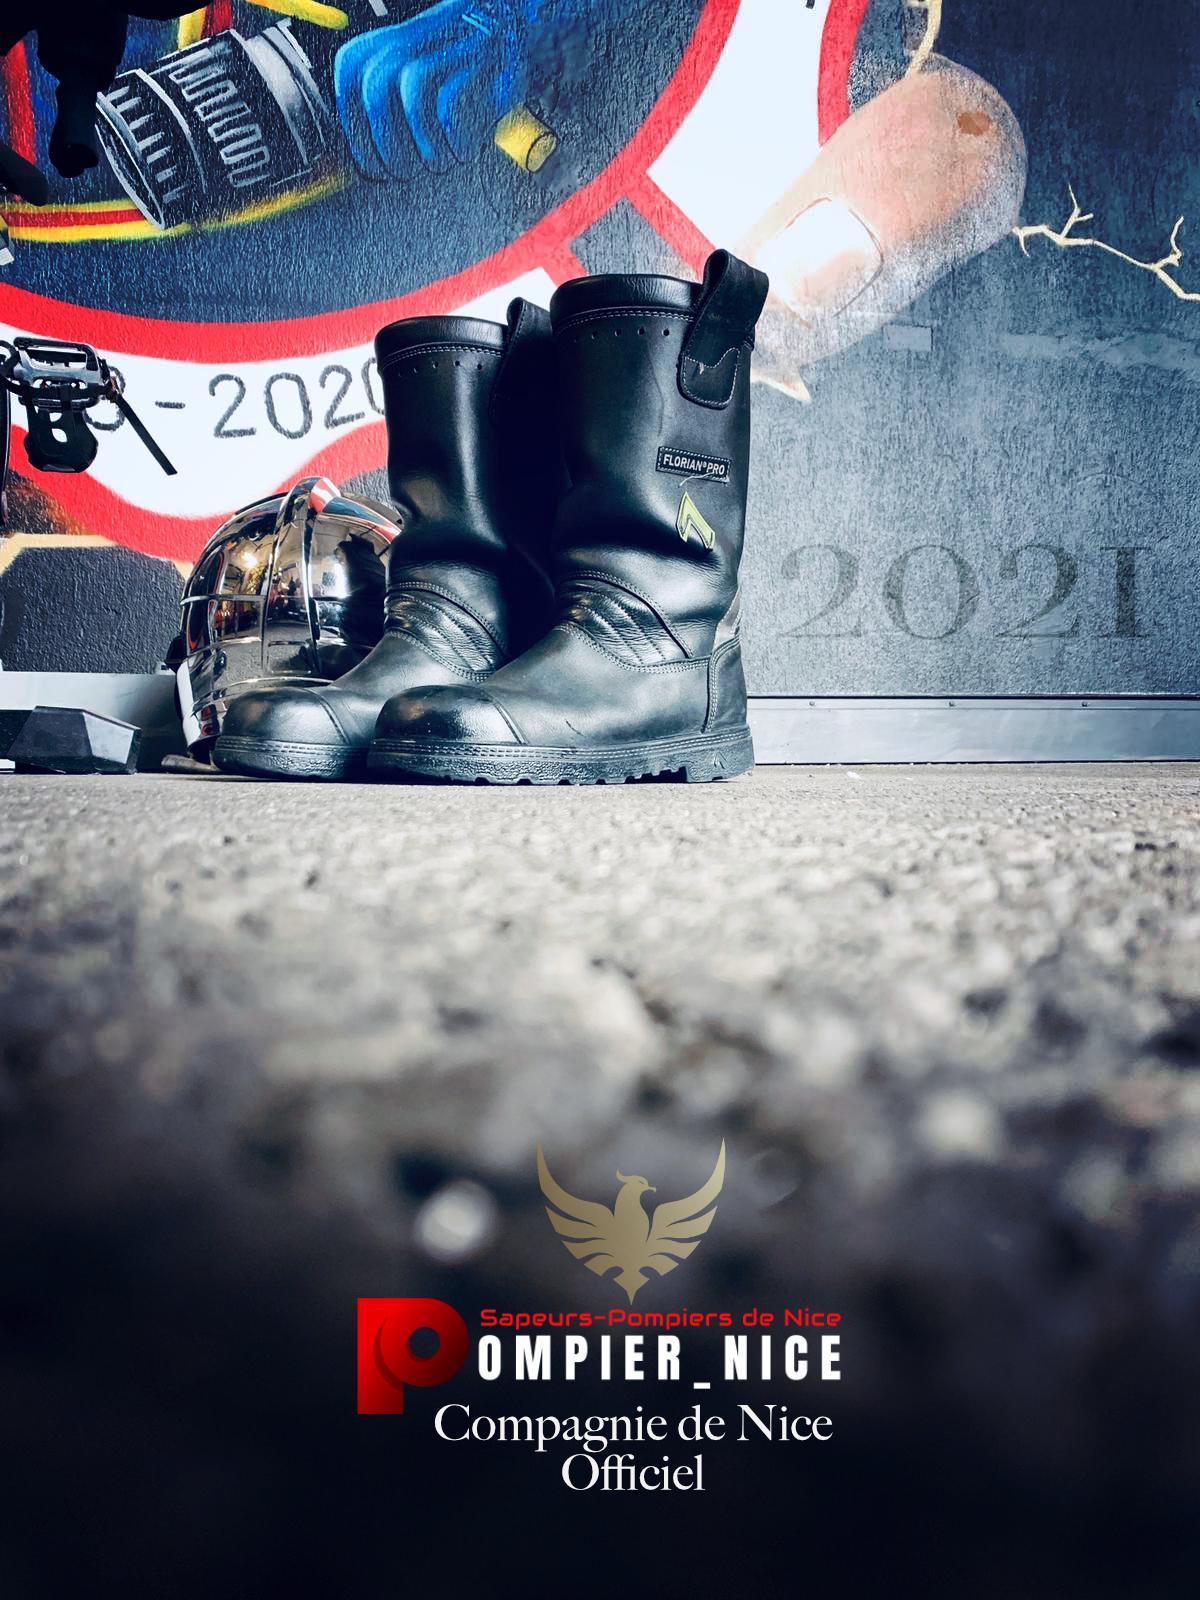 New year, Pompier_nice, Compagnie de Nice